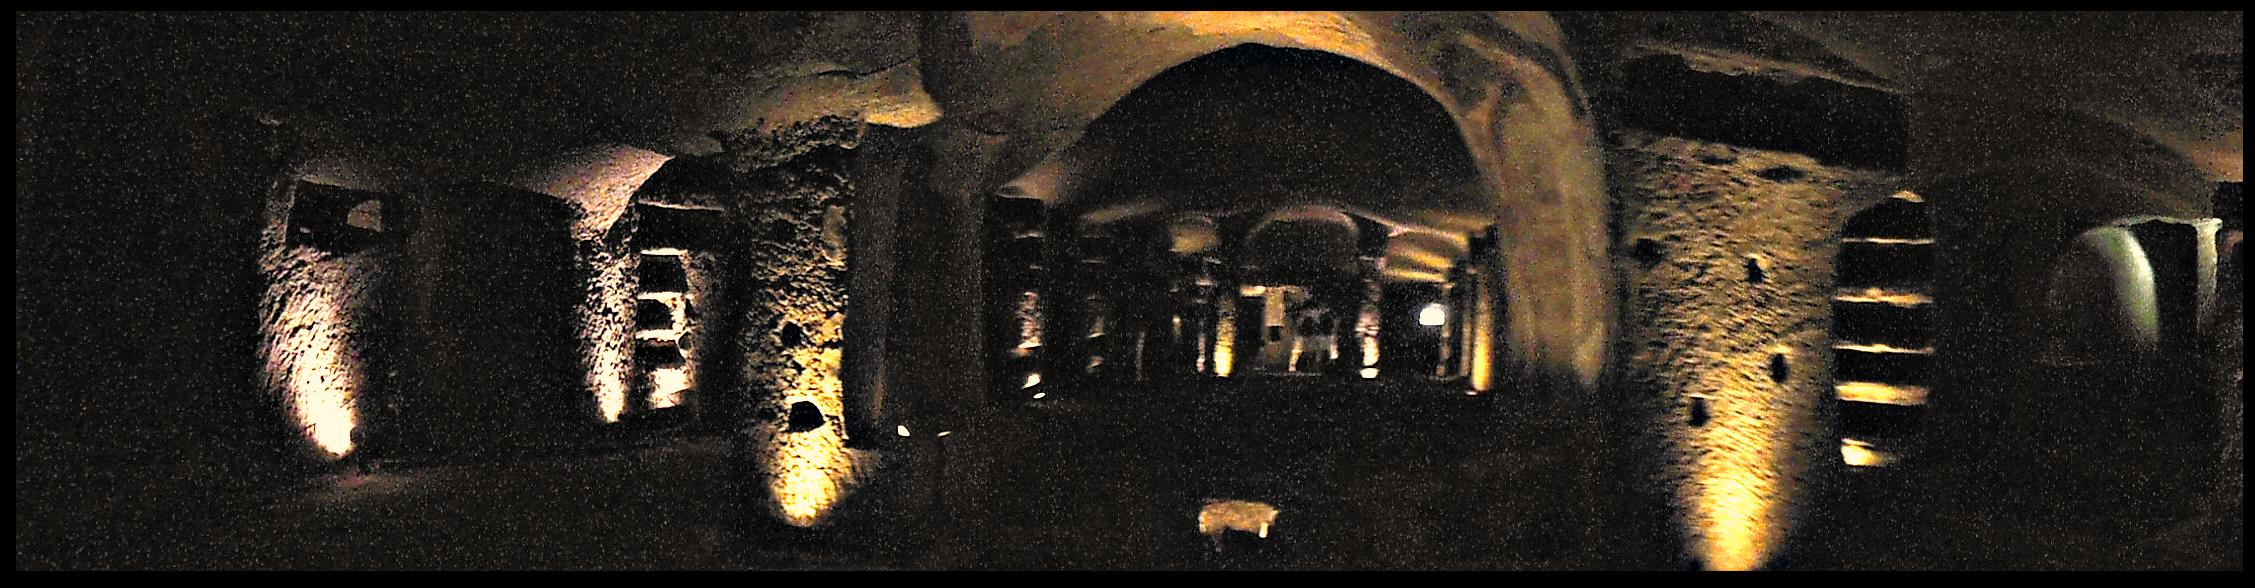 San Gennaro Catacomb